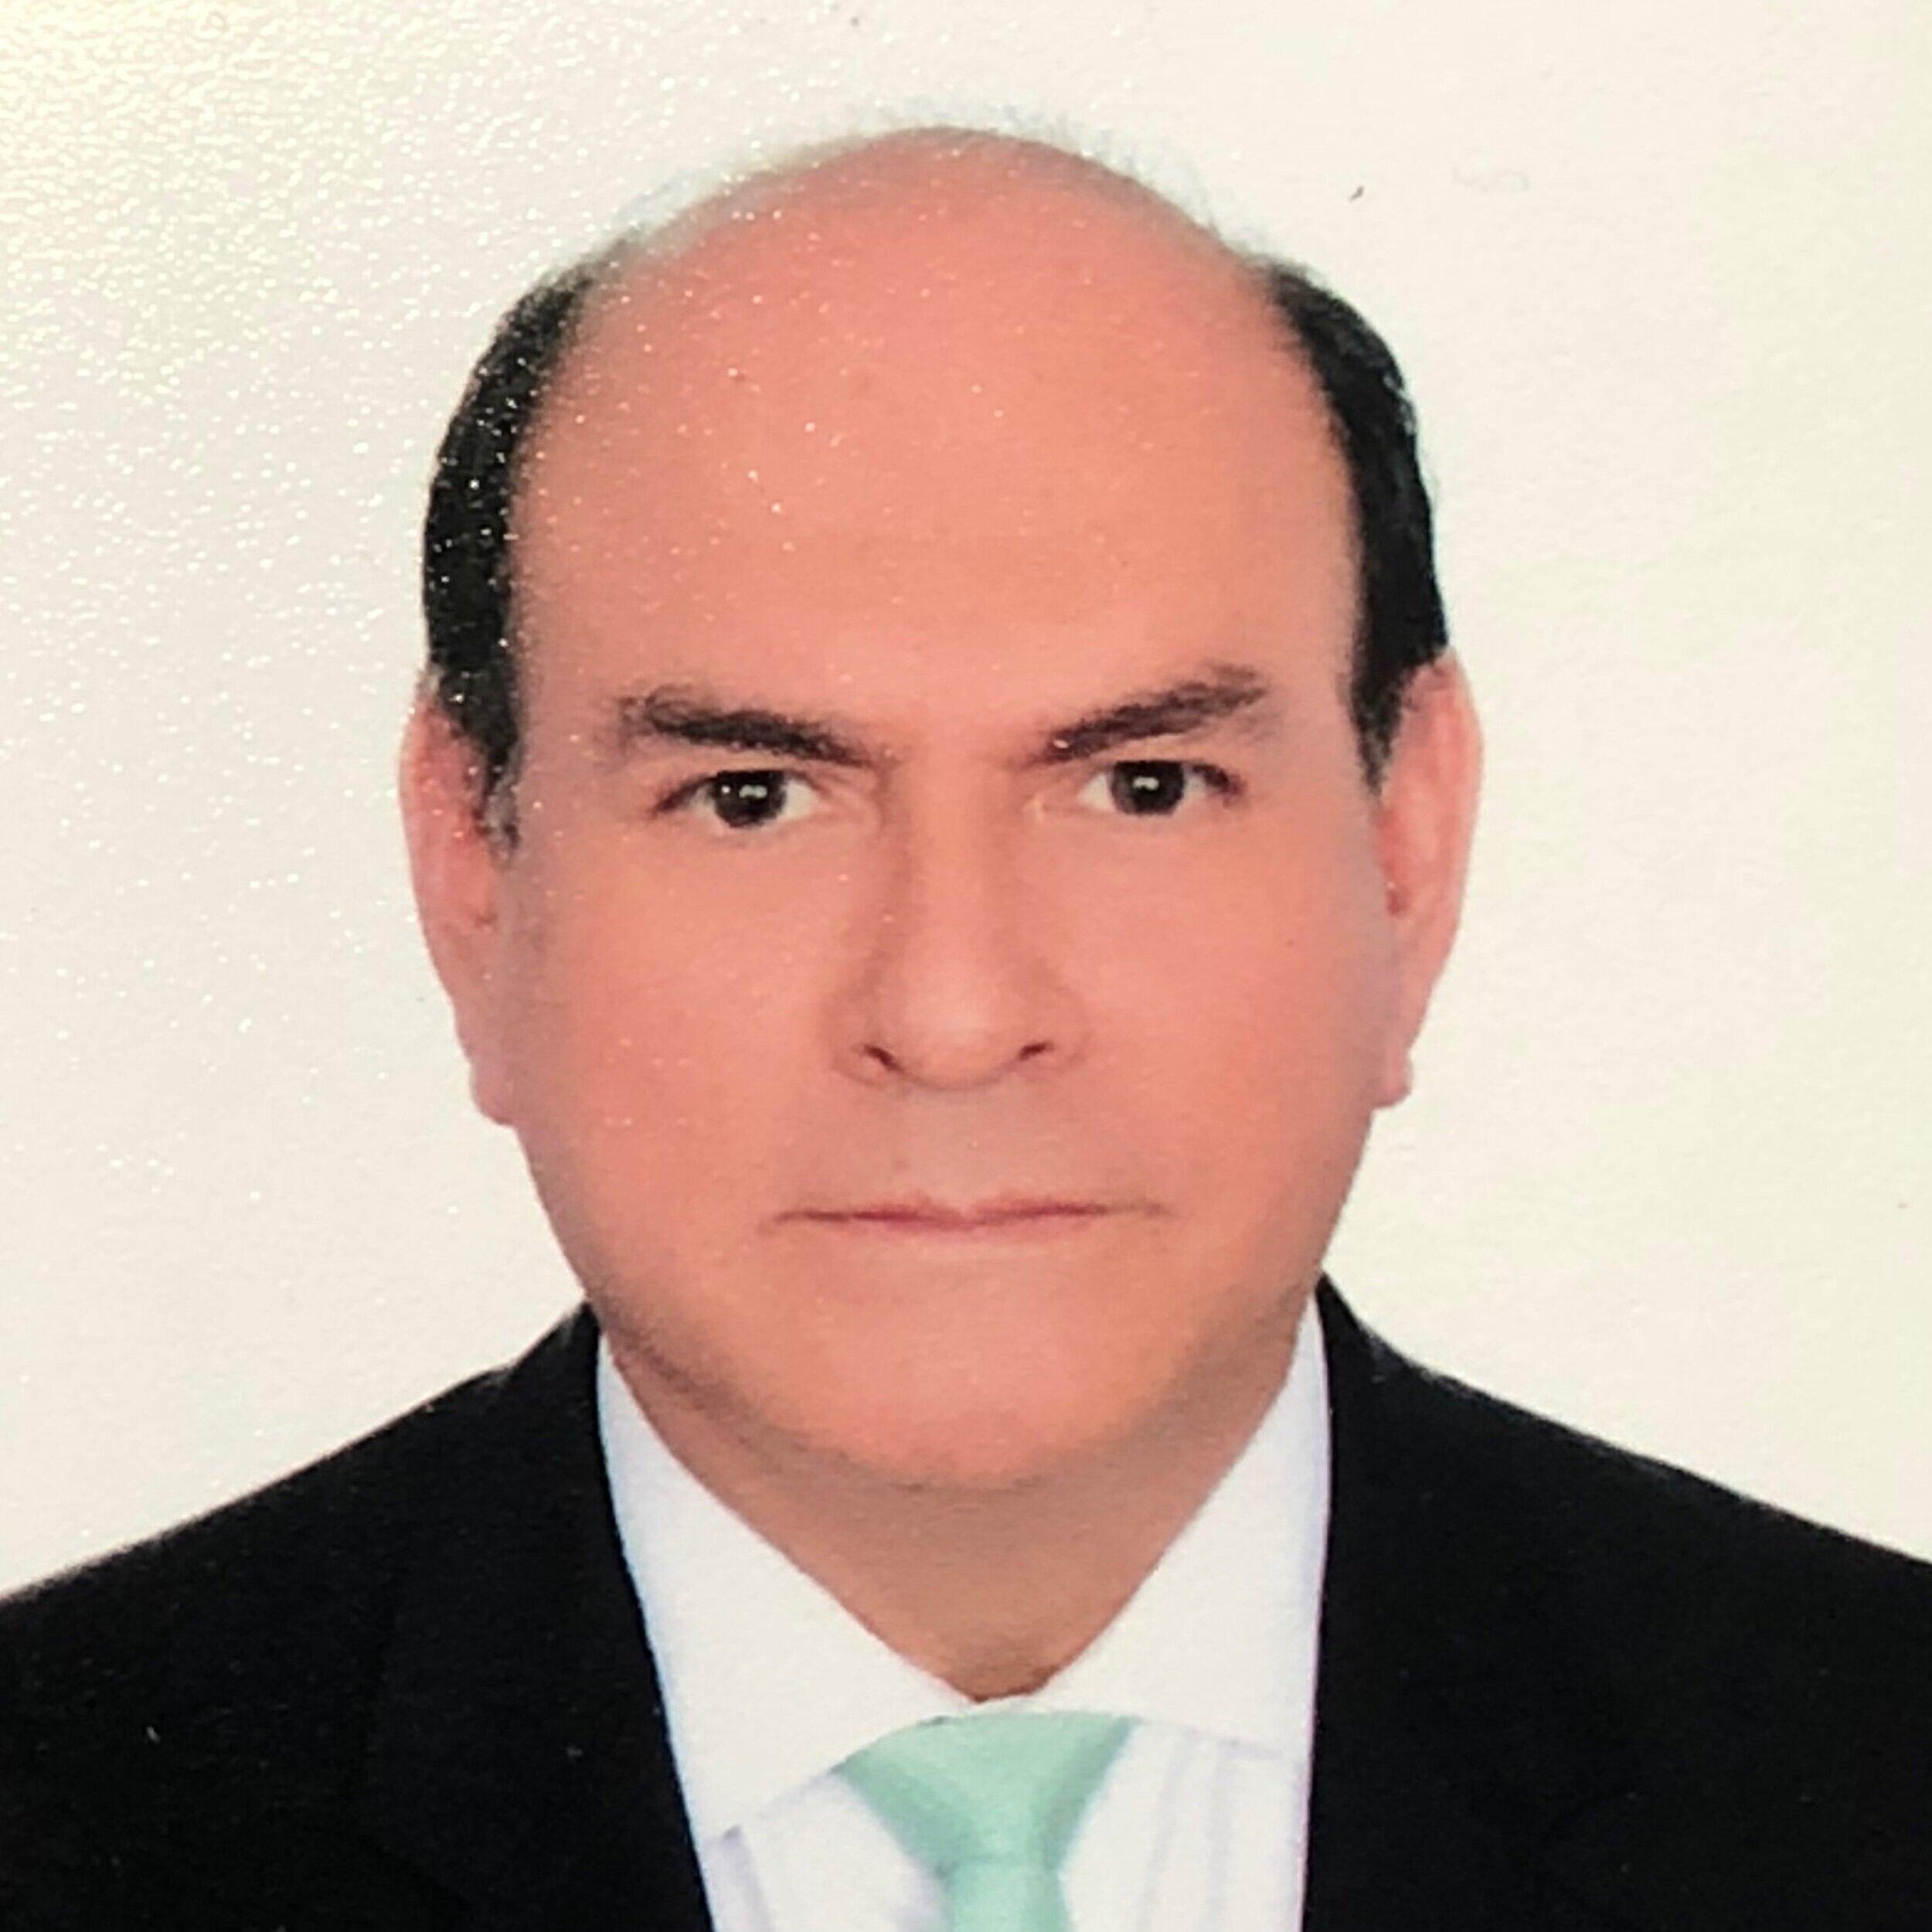 César Landa Arroyo - Pontifical Catholic University of Peru